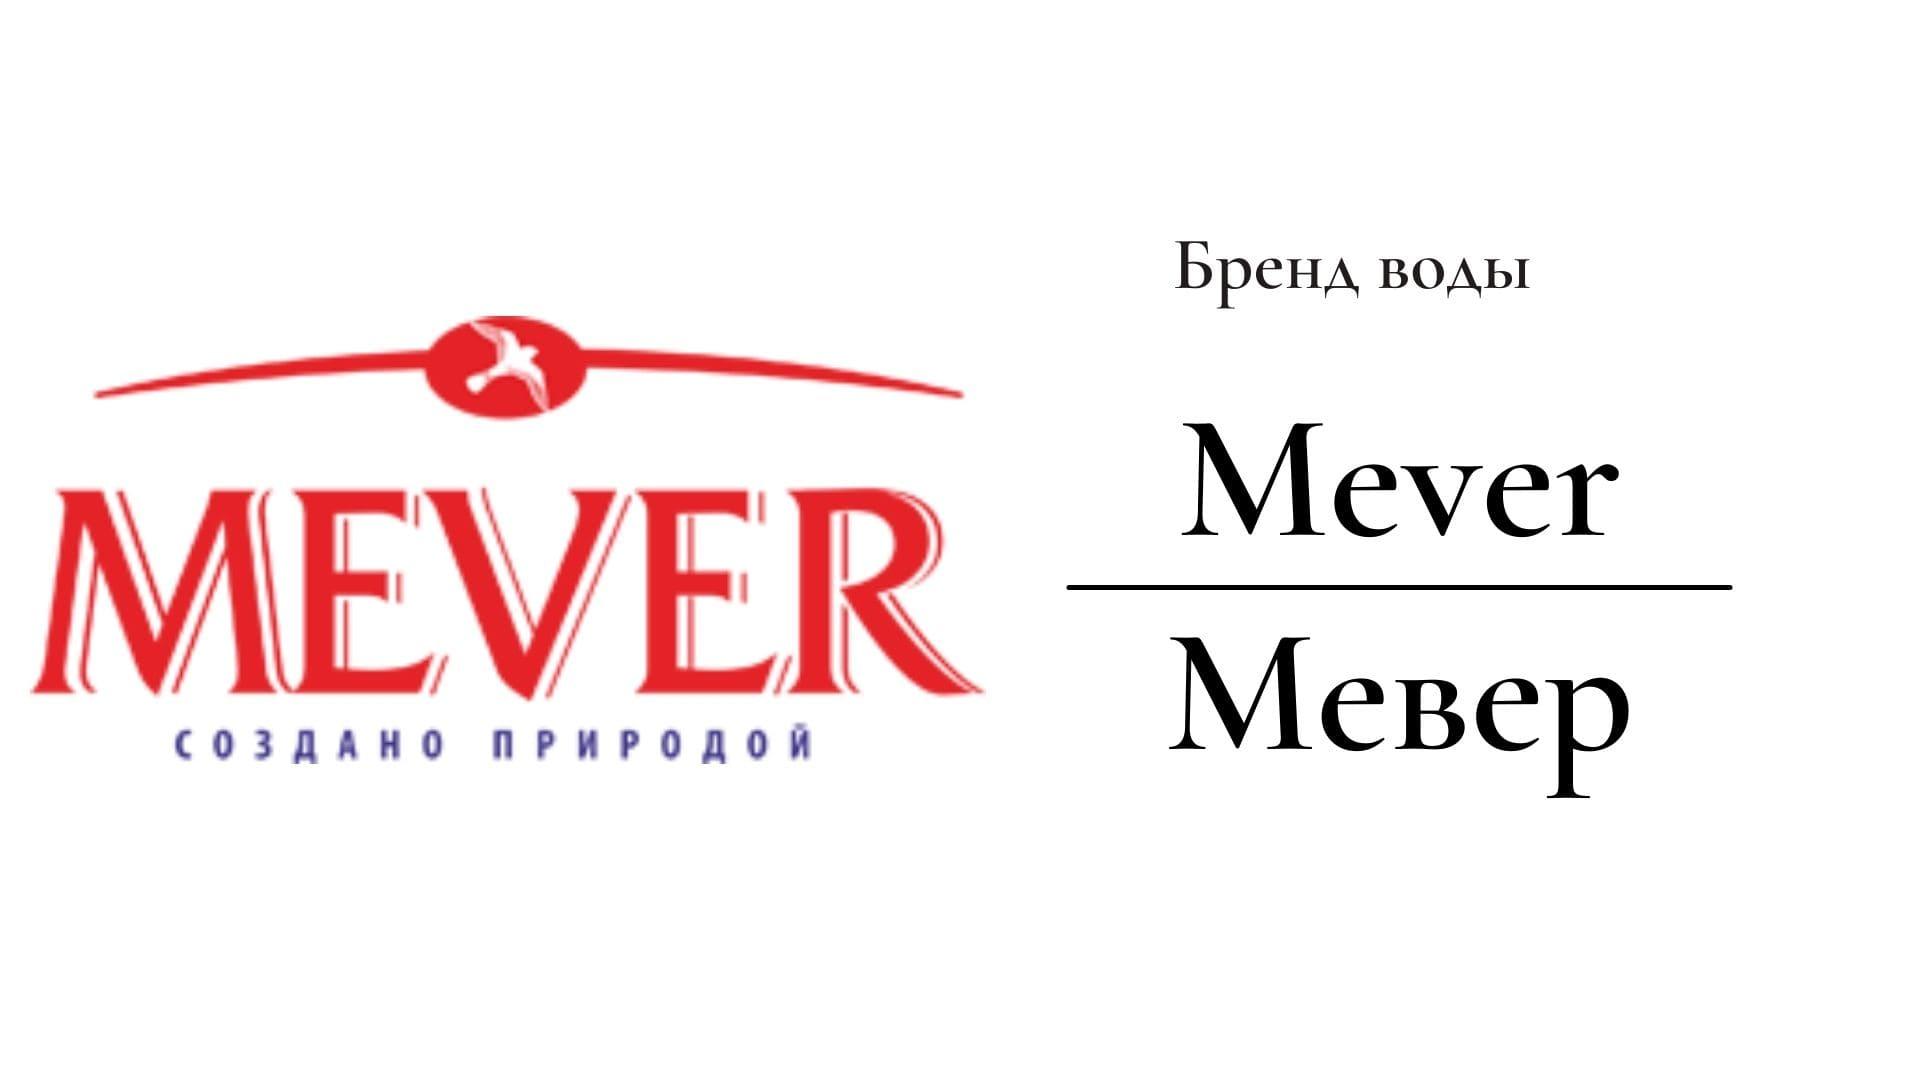 бренд мевер логотип